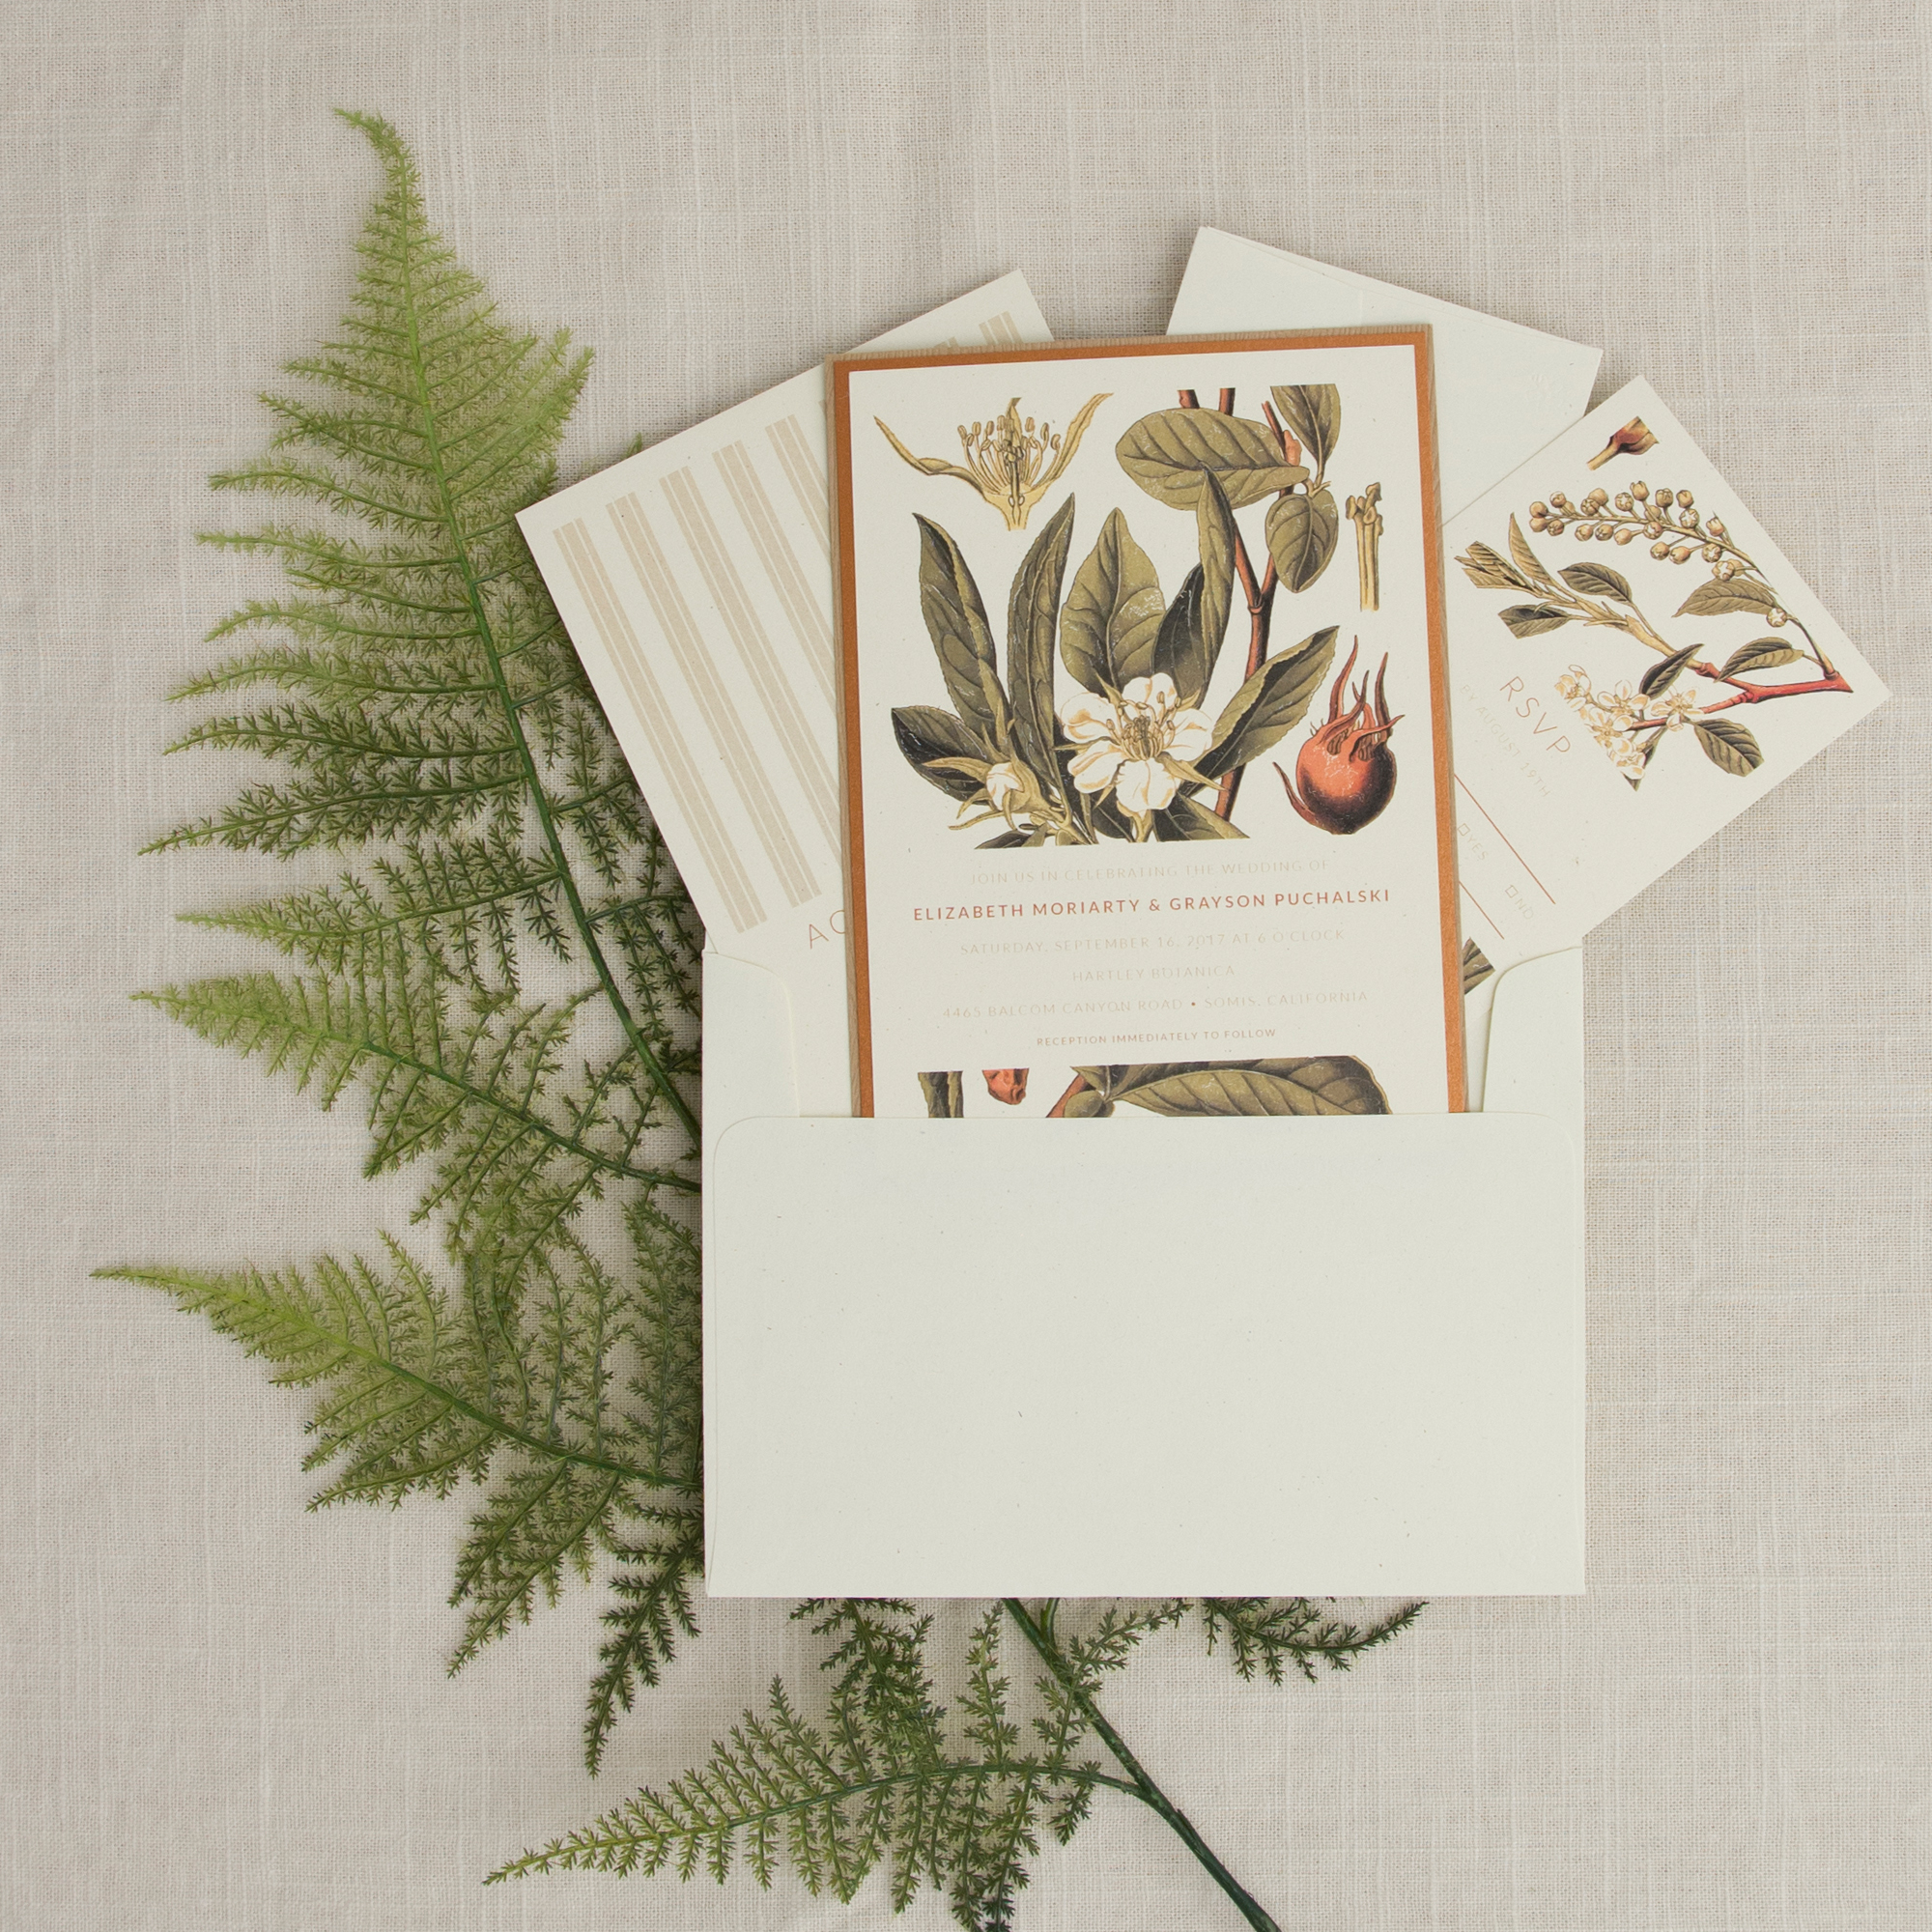 041416 Botanical Illustration.jpg